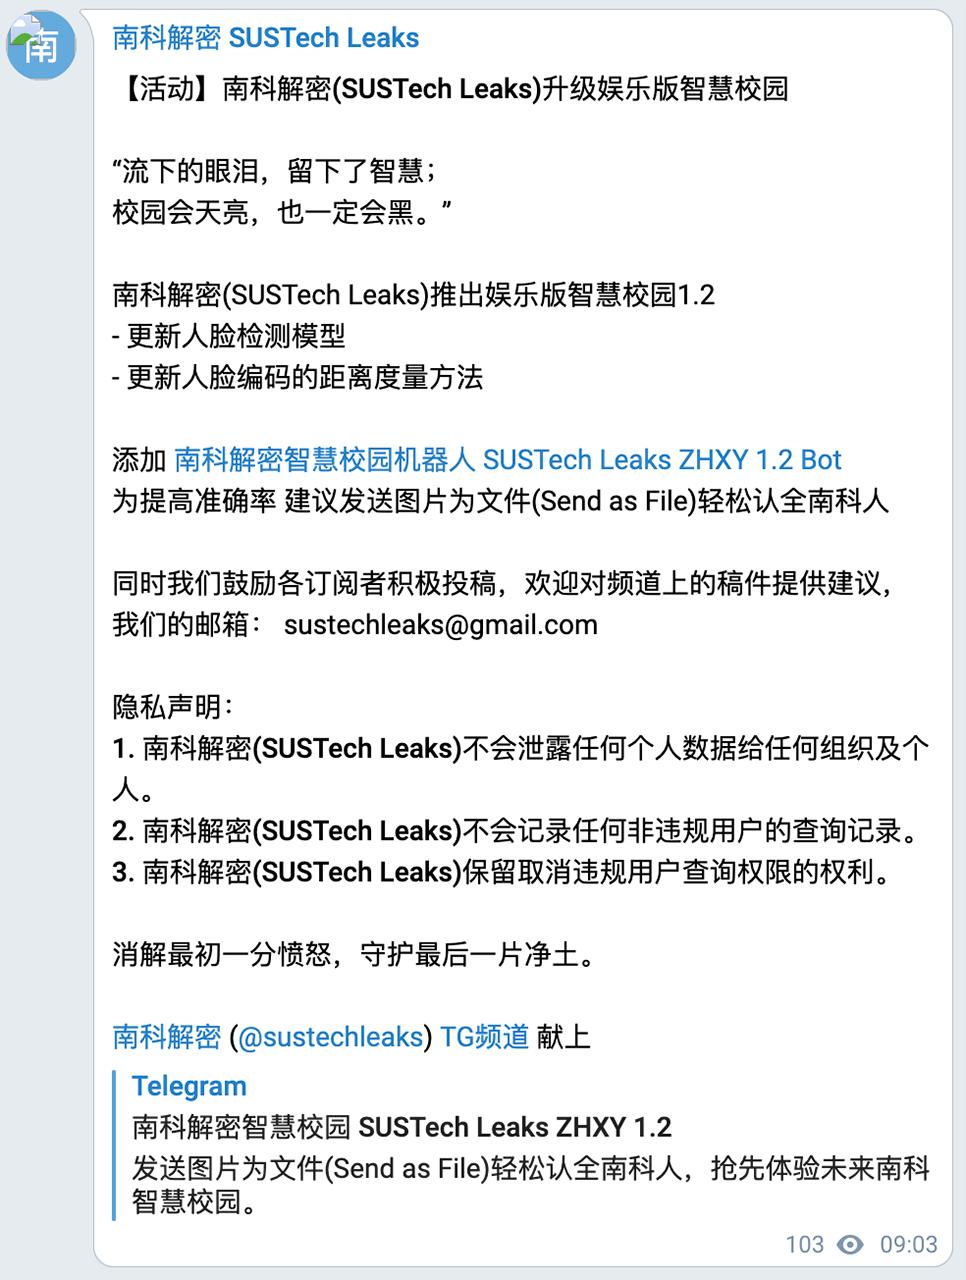 Telegram Channel 信息